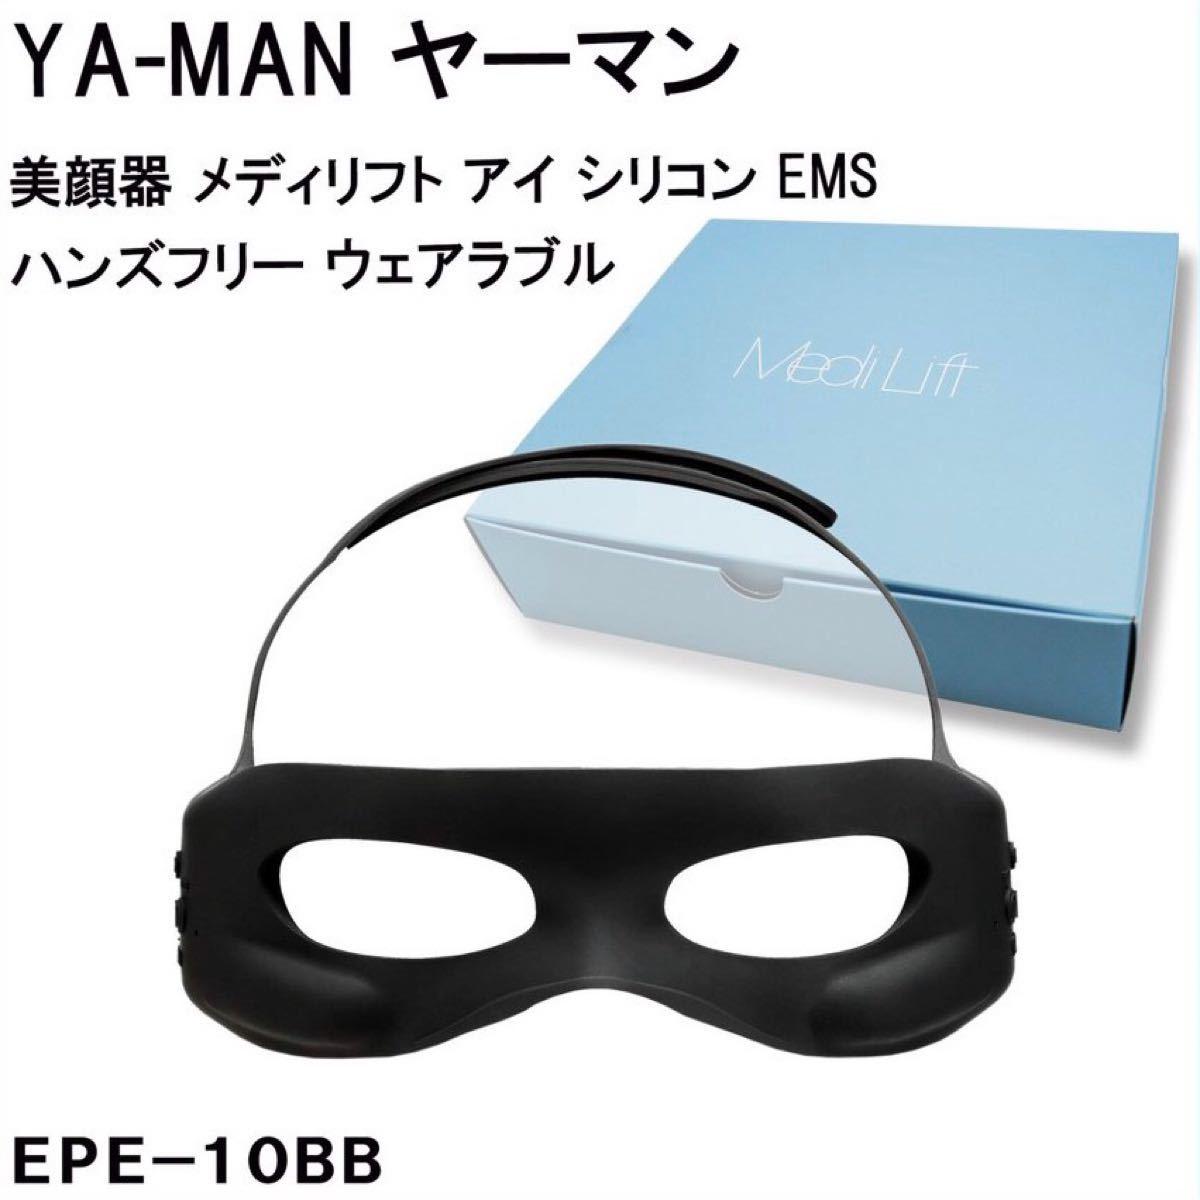 YAMAN ヤーマン メディリフトアイ セラム20g EPE-10BB